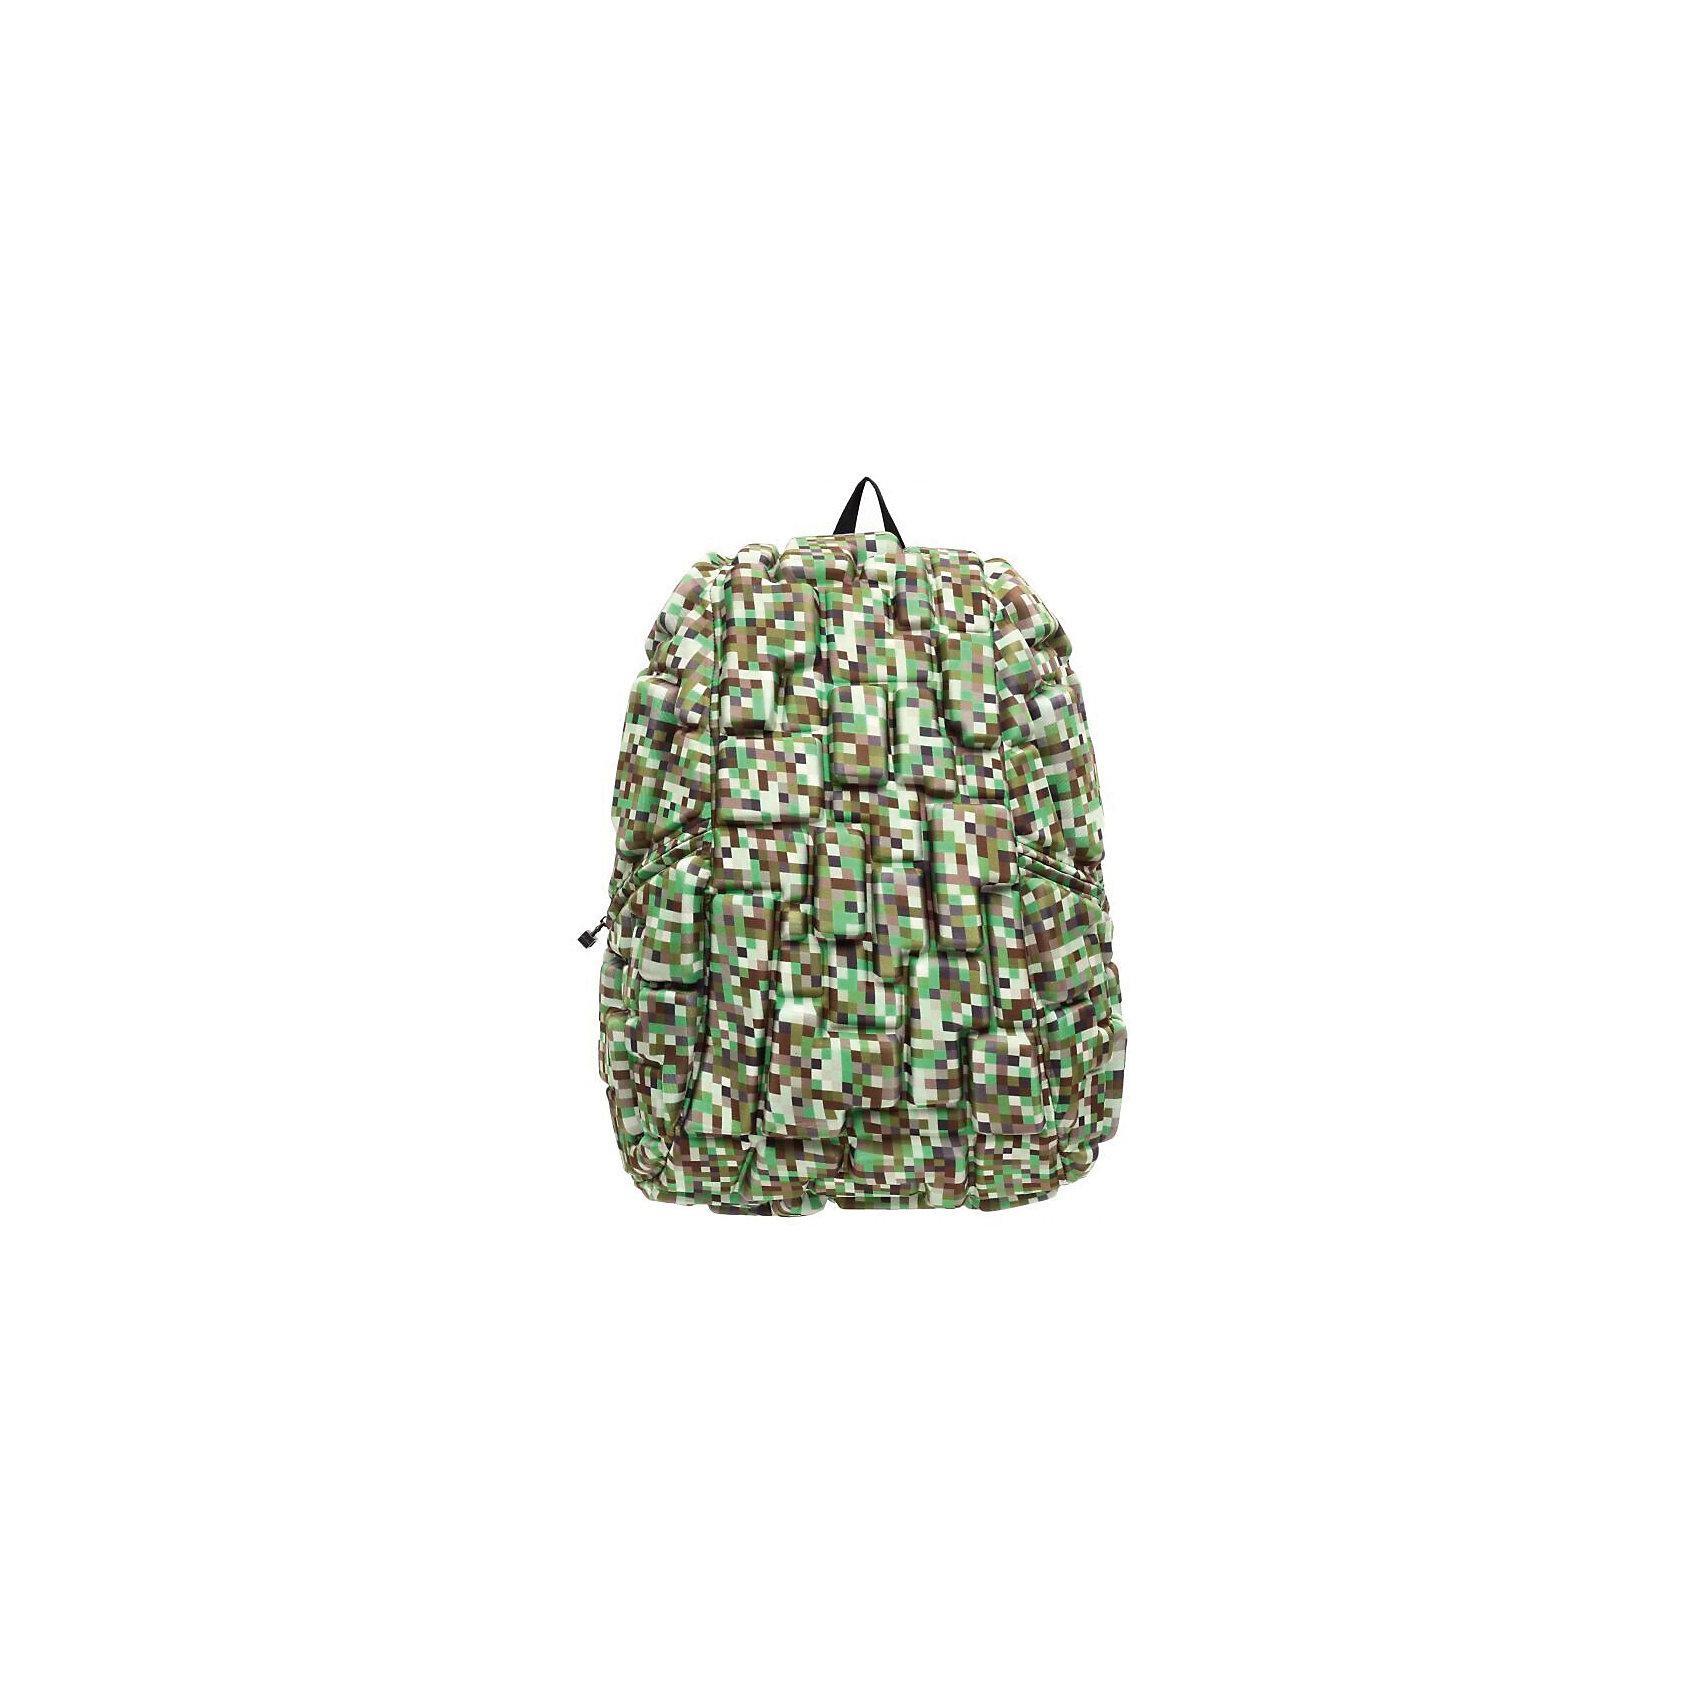 Рюкзак Blok Full Digital Green, цвет зеленый мультиРюкзаки<br>Вес: 0,8 кг<br>Размер: 46х36х20 см<br>Состав: рюкзак<br>Наличие светоотражающих элементов: нет<br>Материал: полиспандекс<br><br>Ширина мм: 460<br>Глубина мм: 360<br>Высота мм: 200<br>Вес г: 800<br>Возраст от месяцев: 60<br>Возраст до месяцев: 720<br>Пол: Унисекс<br>Возраст: Детский<br>SKU: 7054112